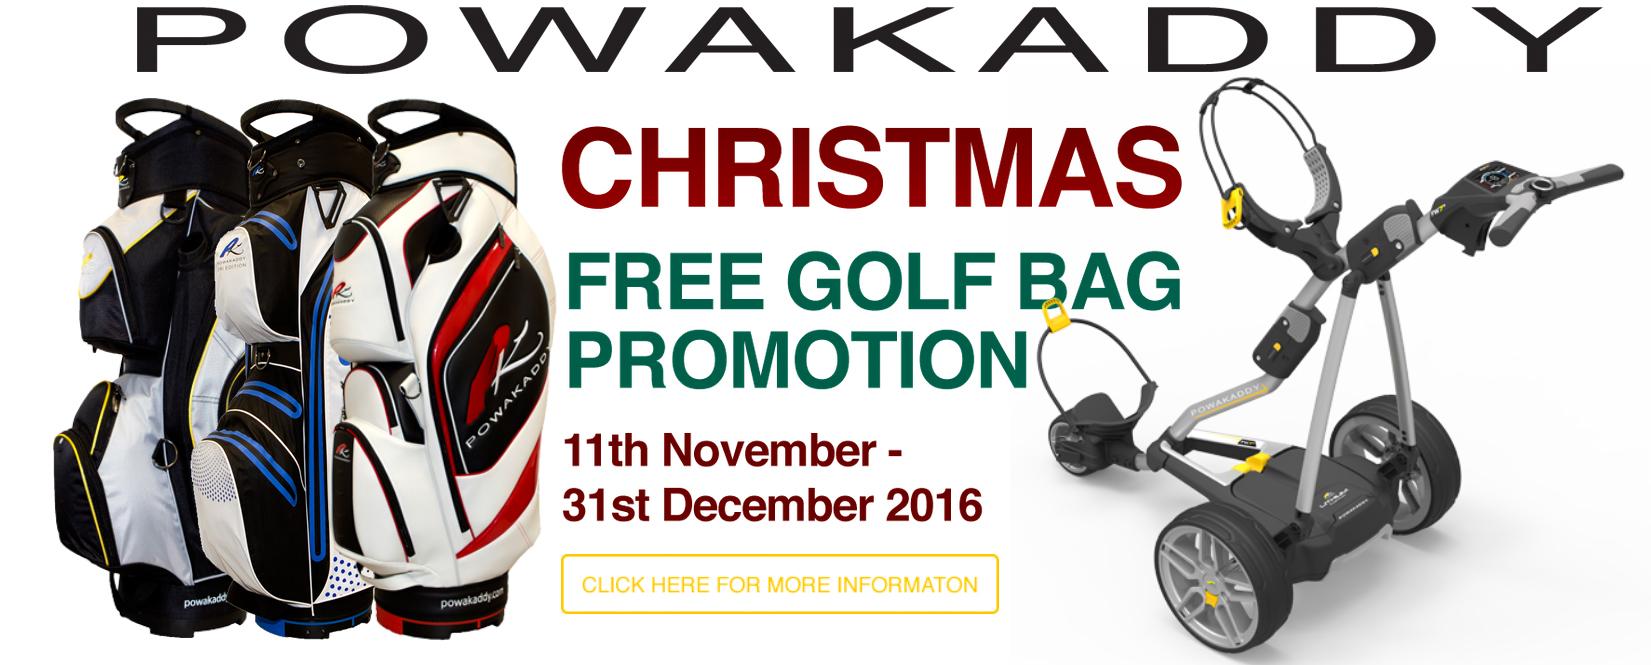 Powakaddy free bag deal